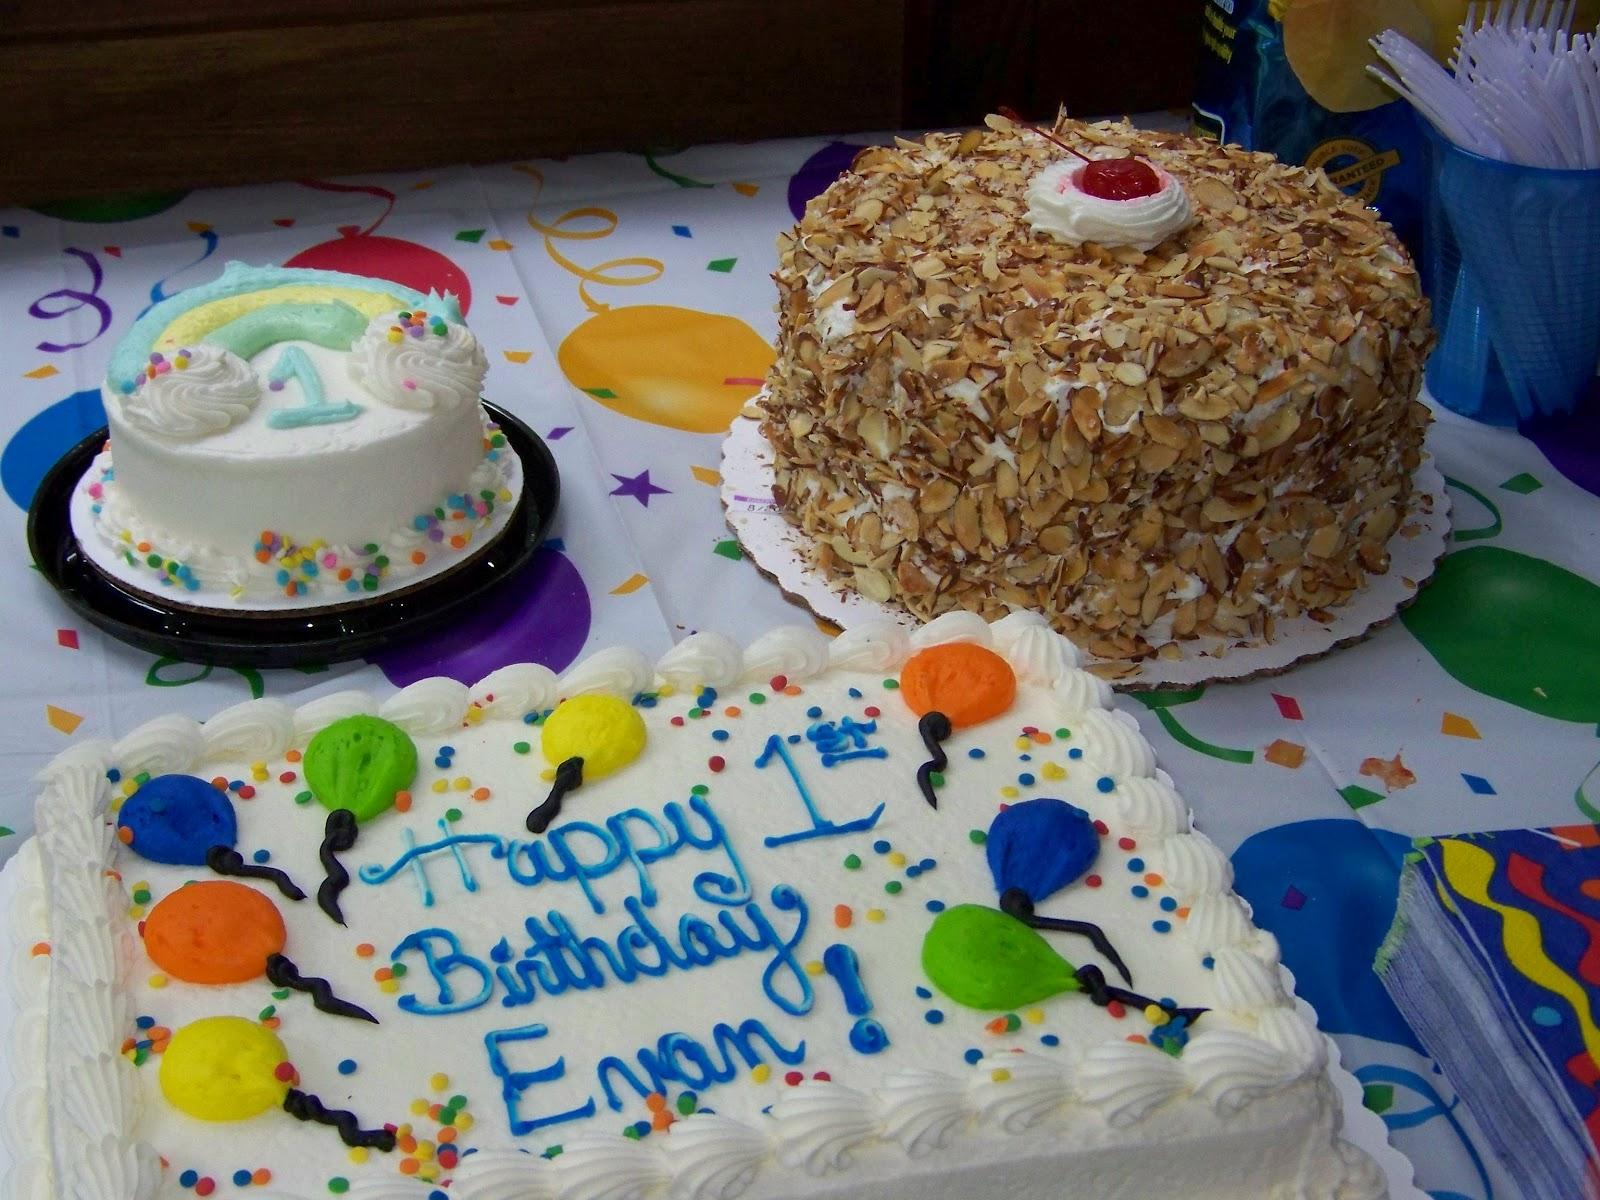 The New Hartman The First Birthday Cake